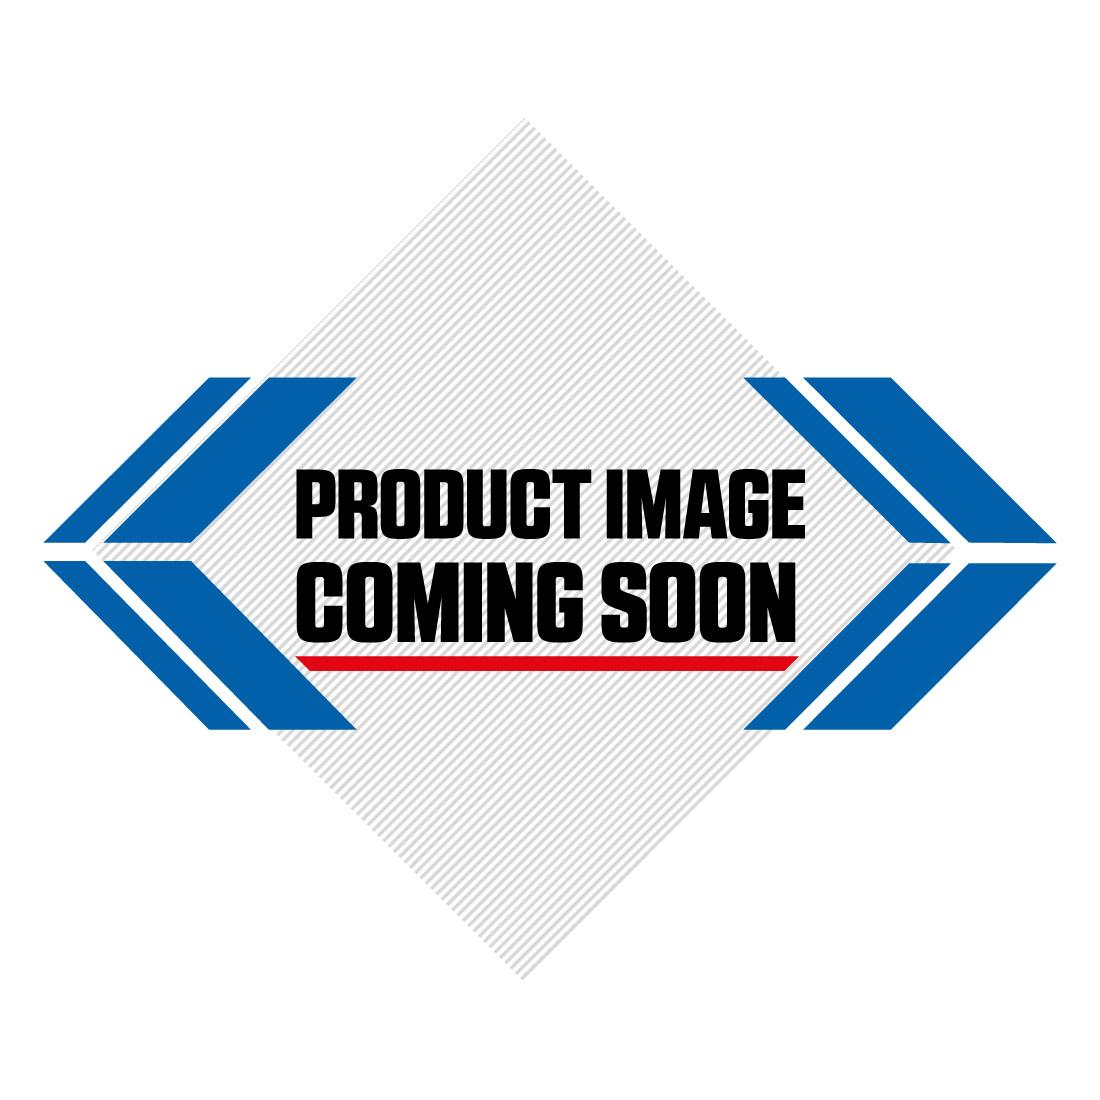 DJI Mavic 2 Pro Drone Image-1>